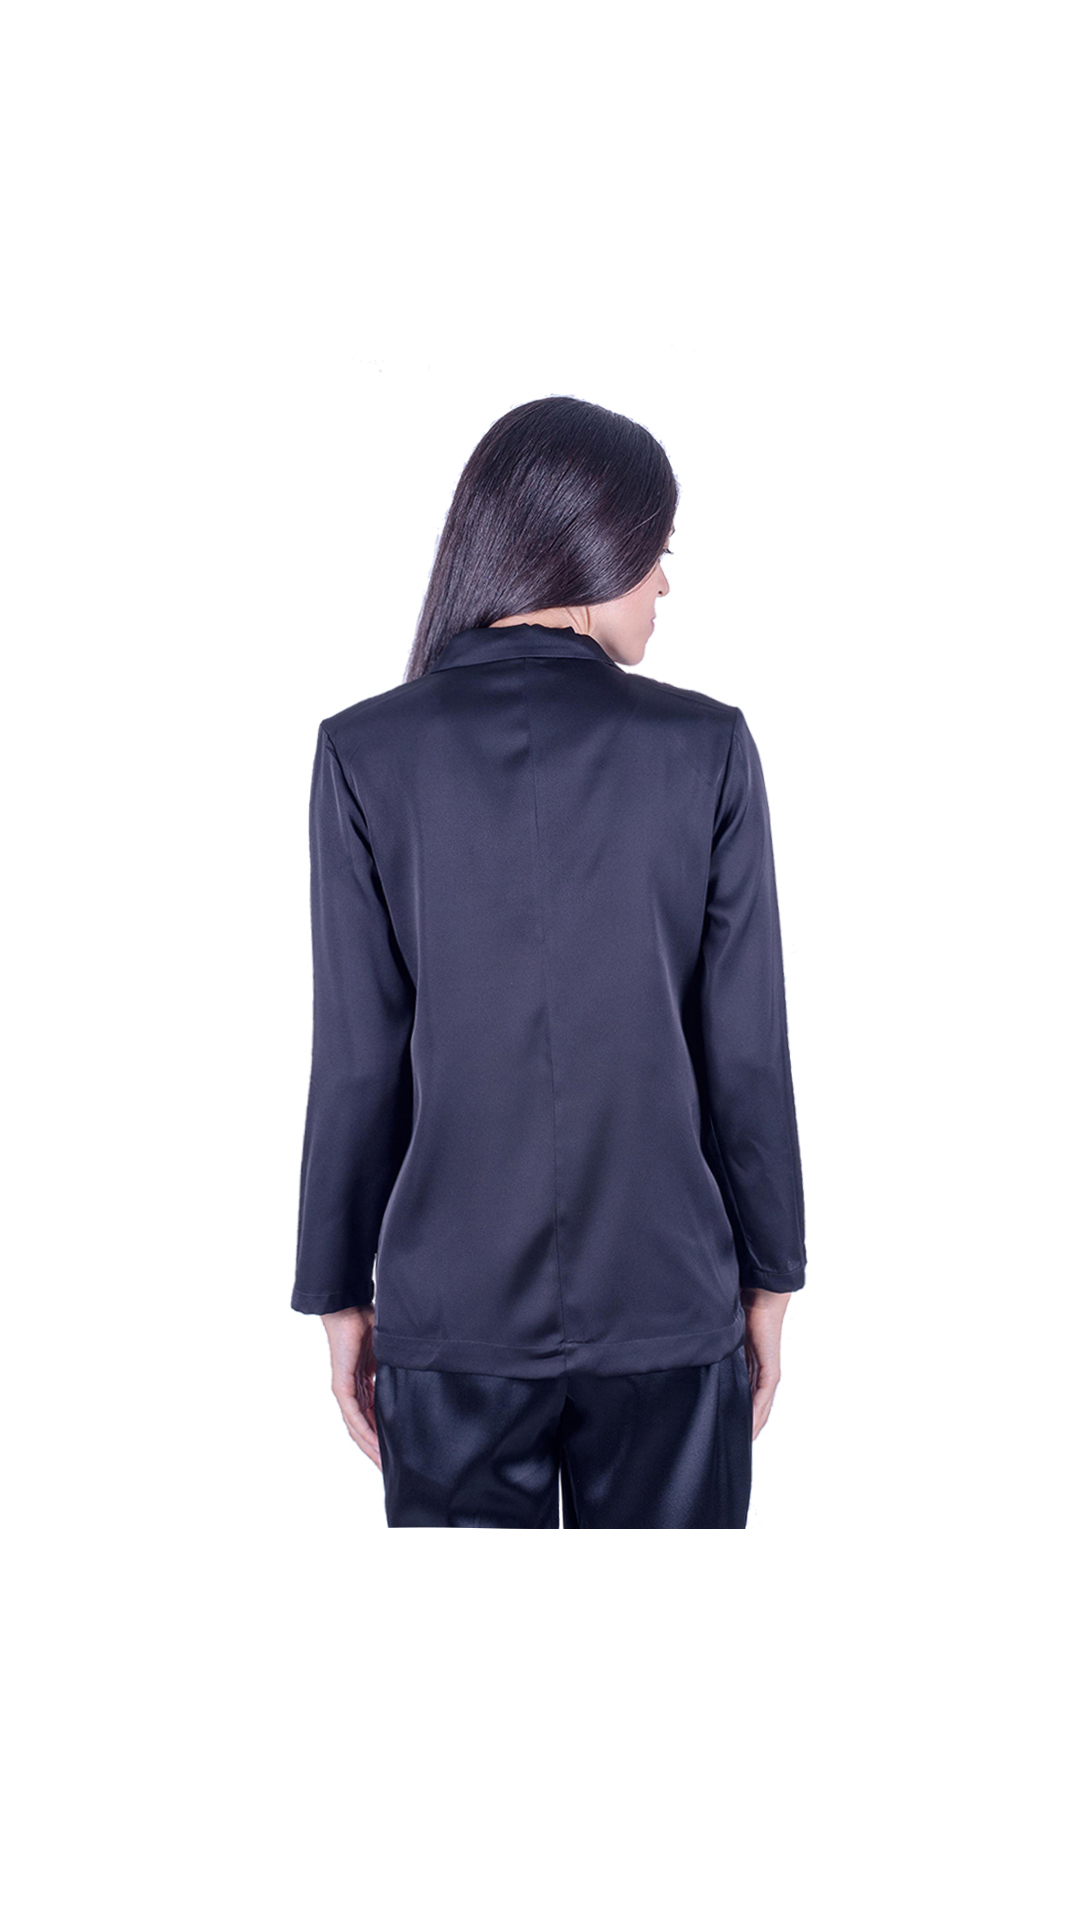 GIASILK01 NERO GIACCA DONNA MANICA LUNGA 1 1stAmerican giacca da donna 100% pura seta manica 3/4 - elegante camicia in seta da donna